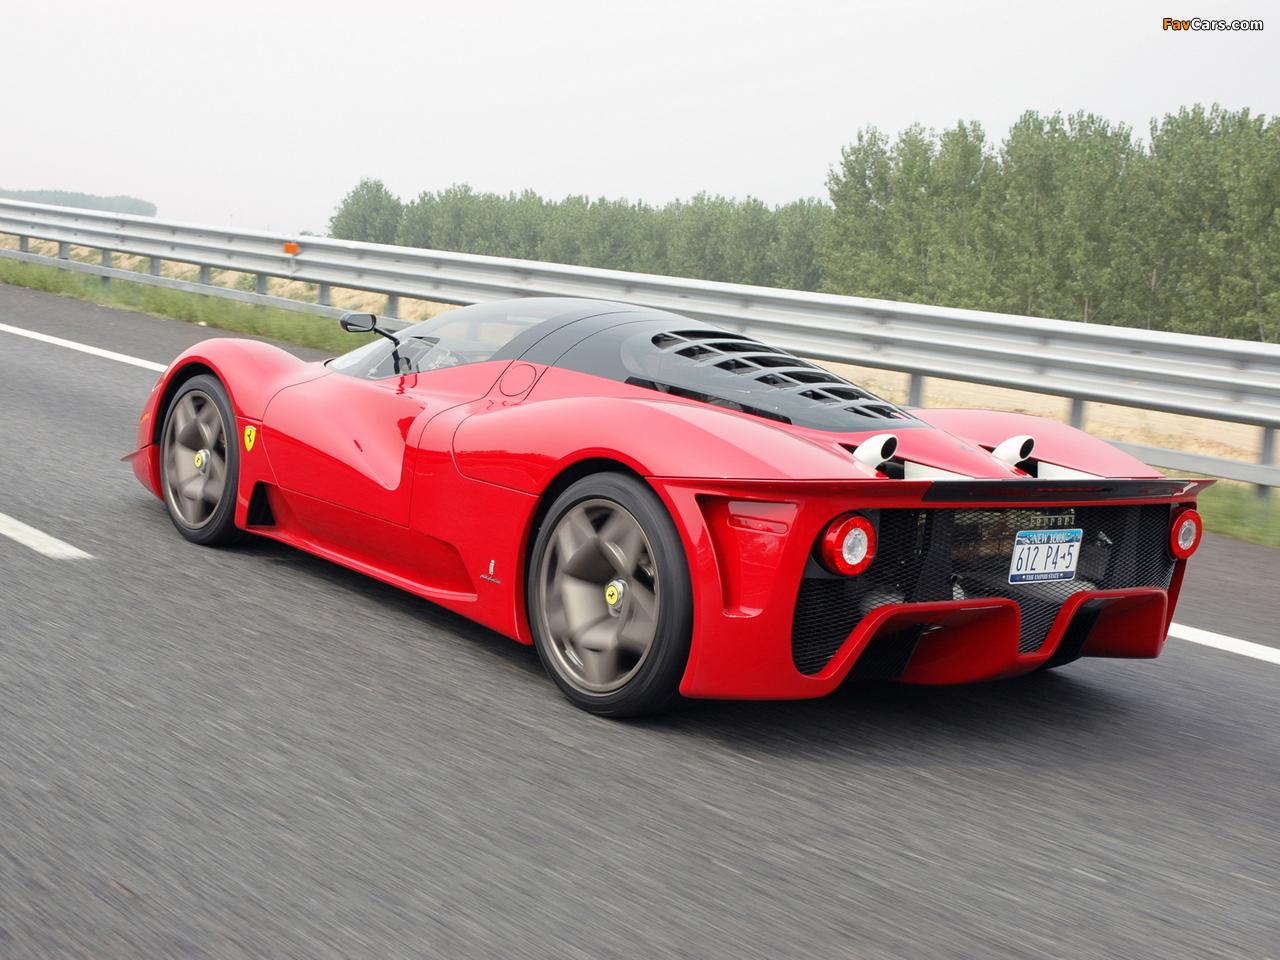 Ferrari P4/5 2006 wallpapers (1280 x 960)